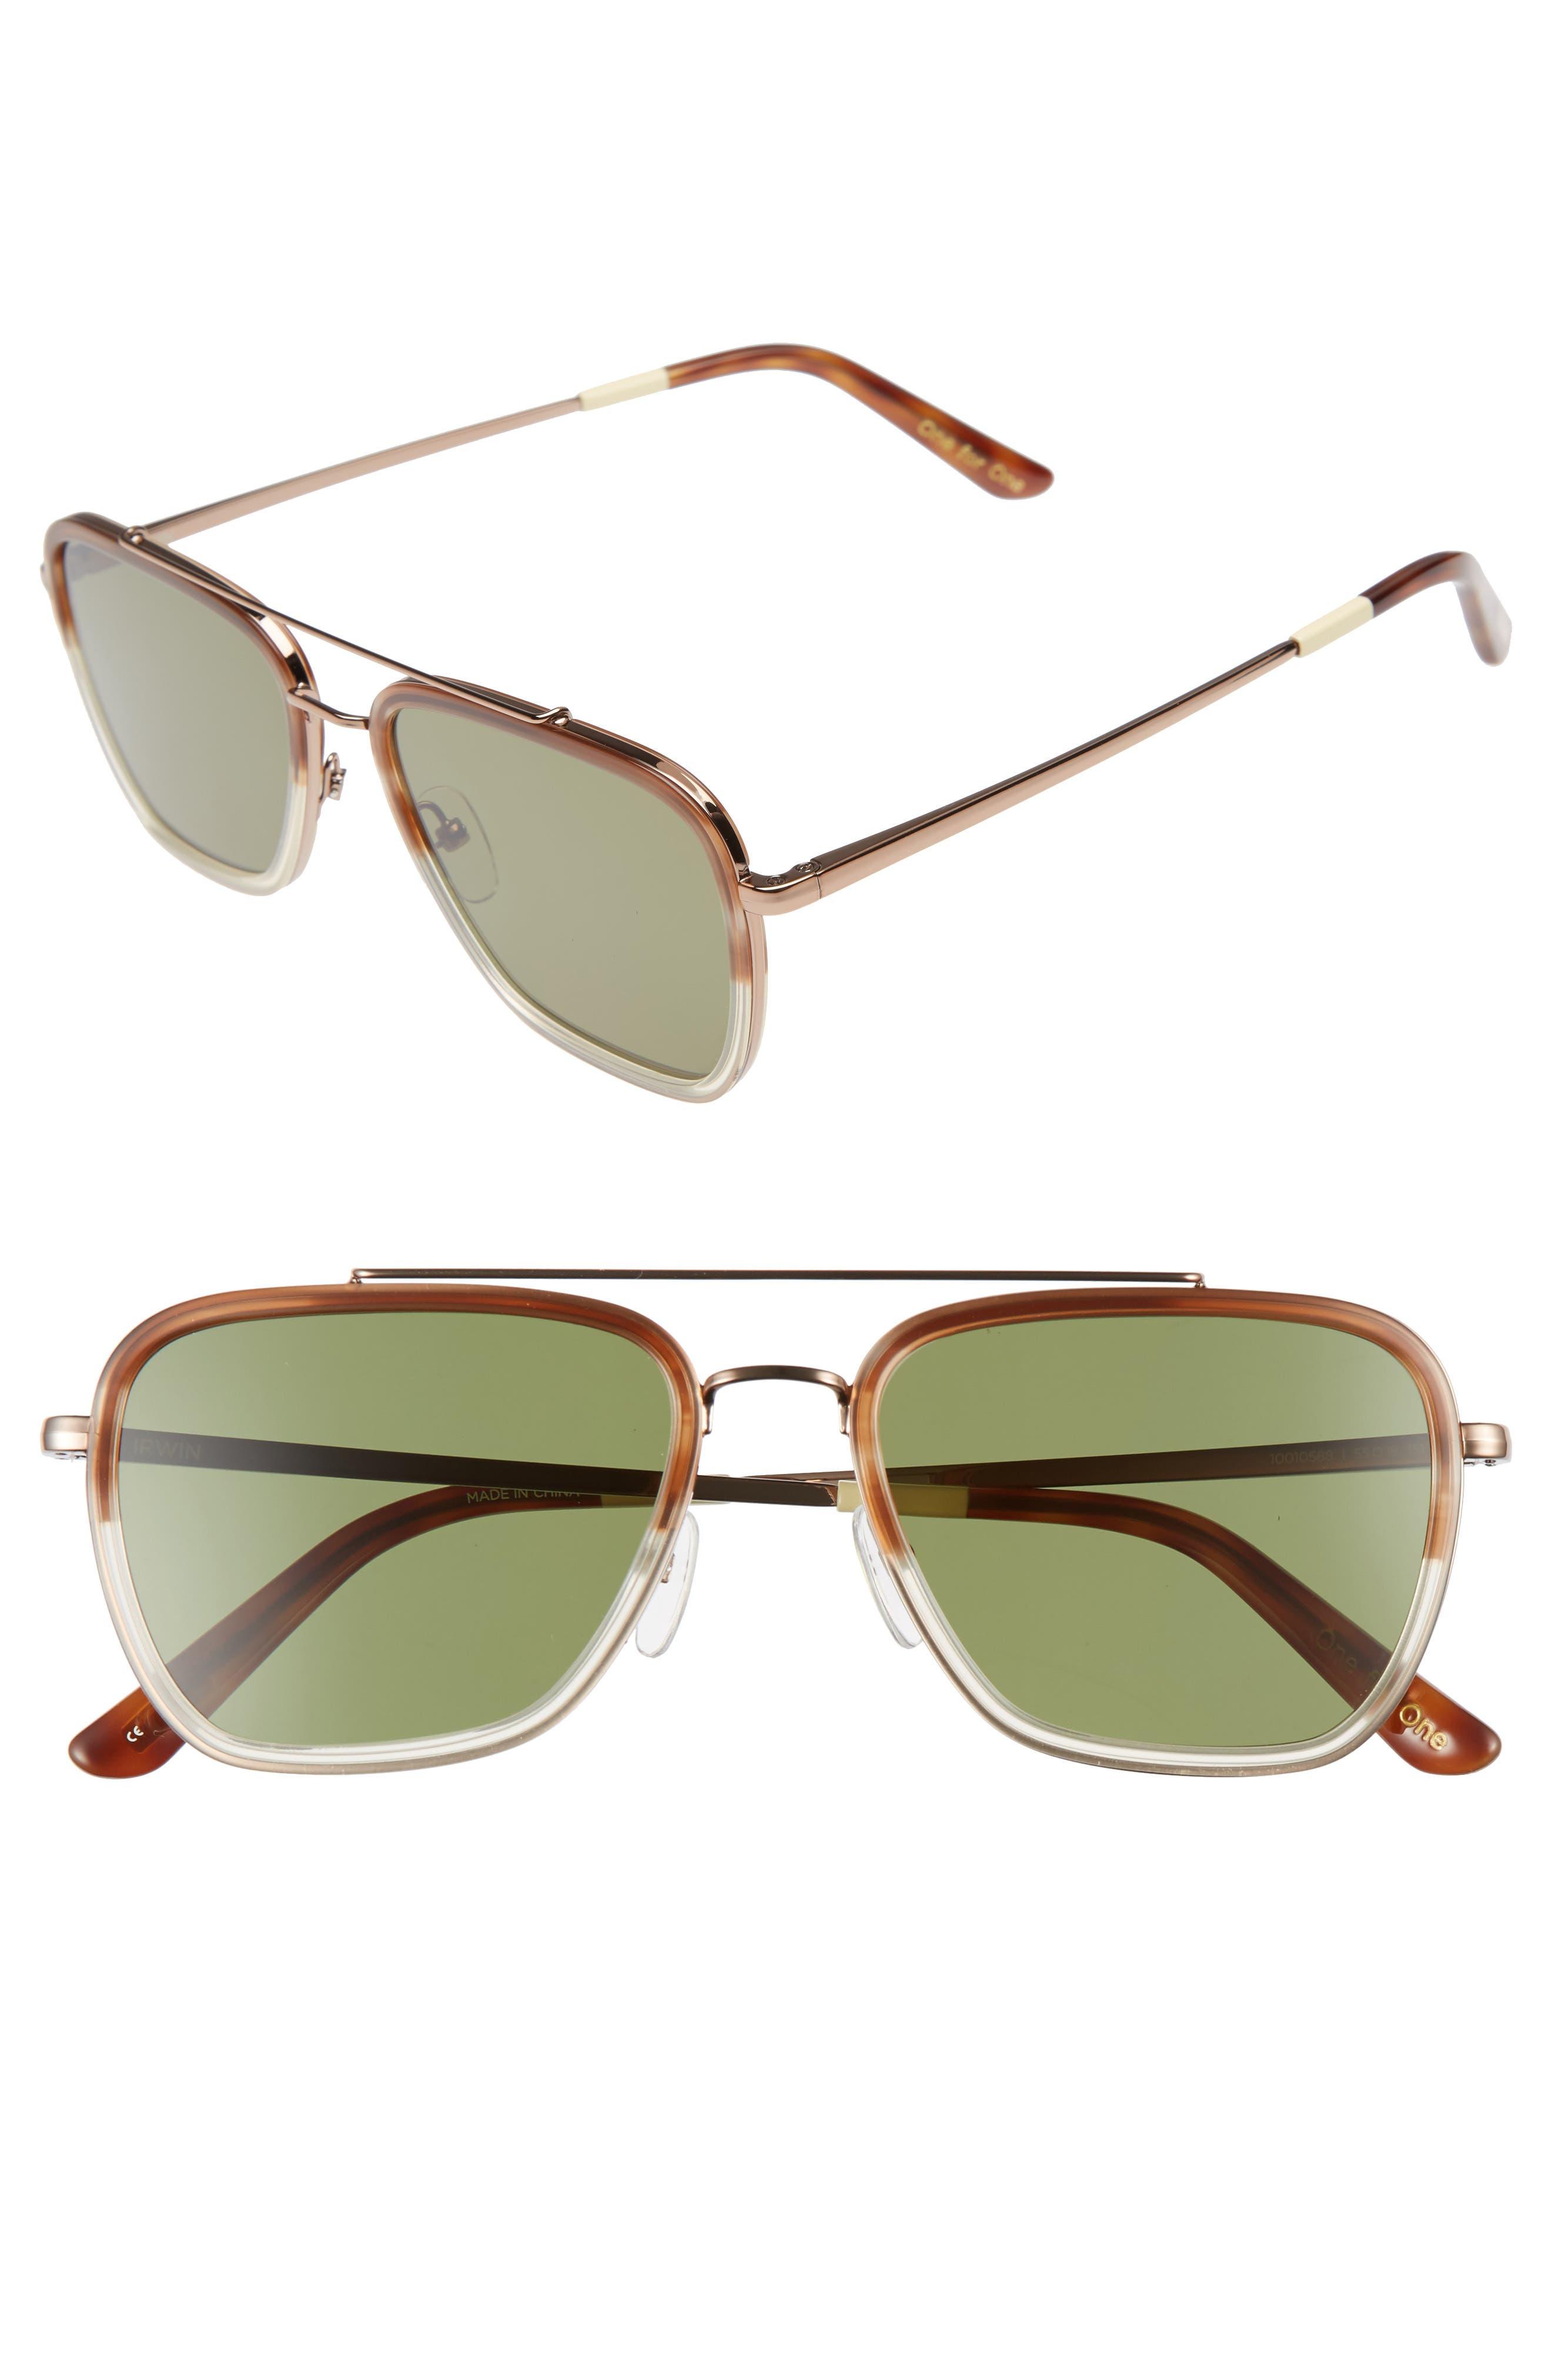 TOMS Irwin 55mm Sunglasses